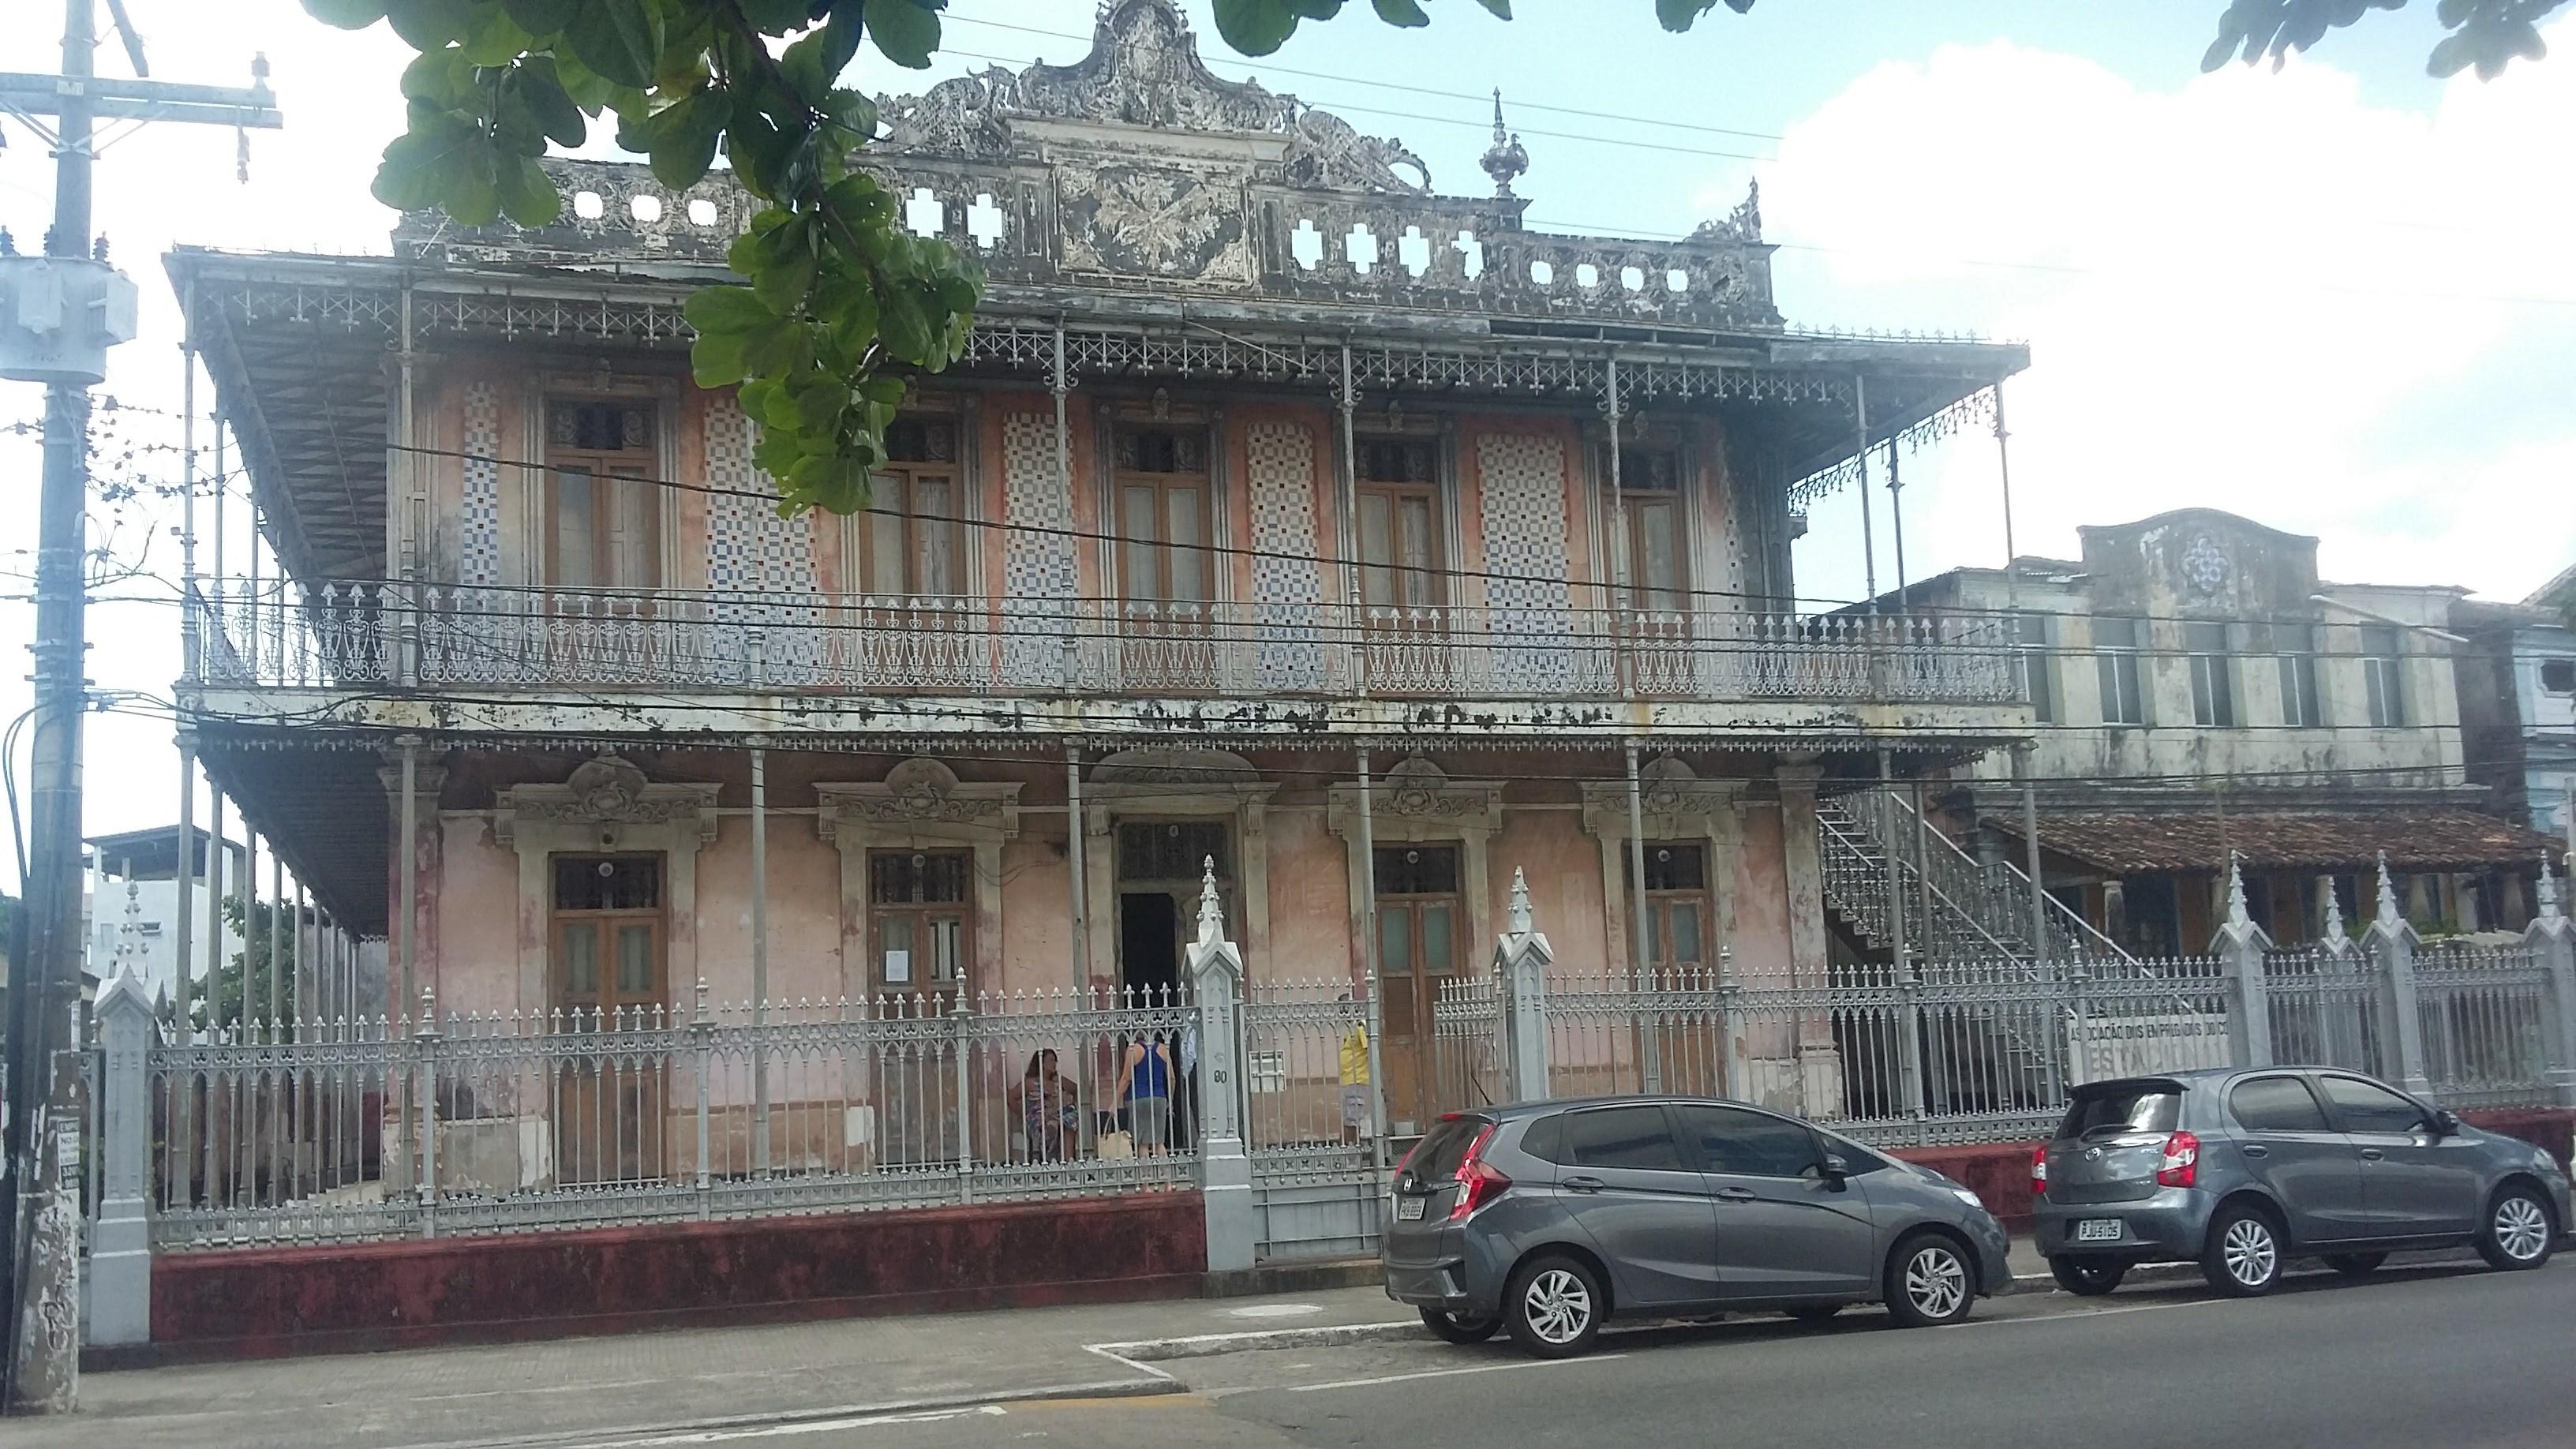 P Lo Regional De Salvador Arthur F Nunes